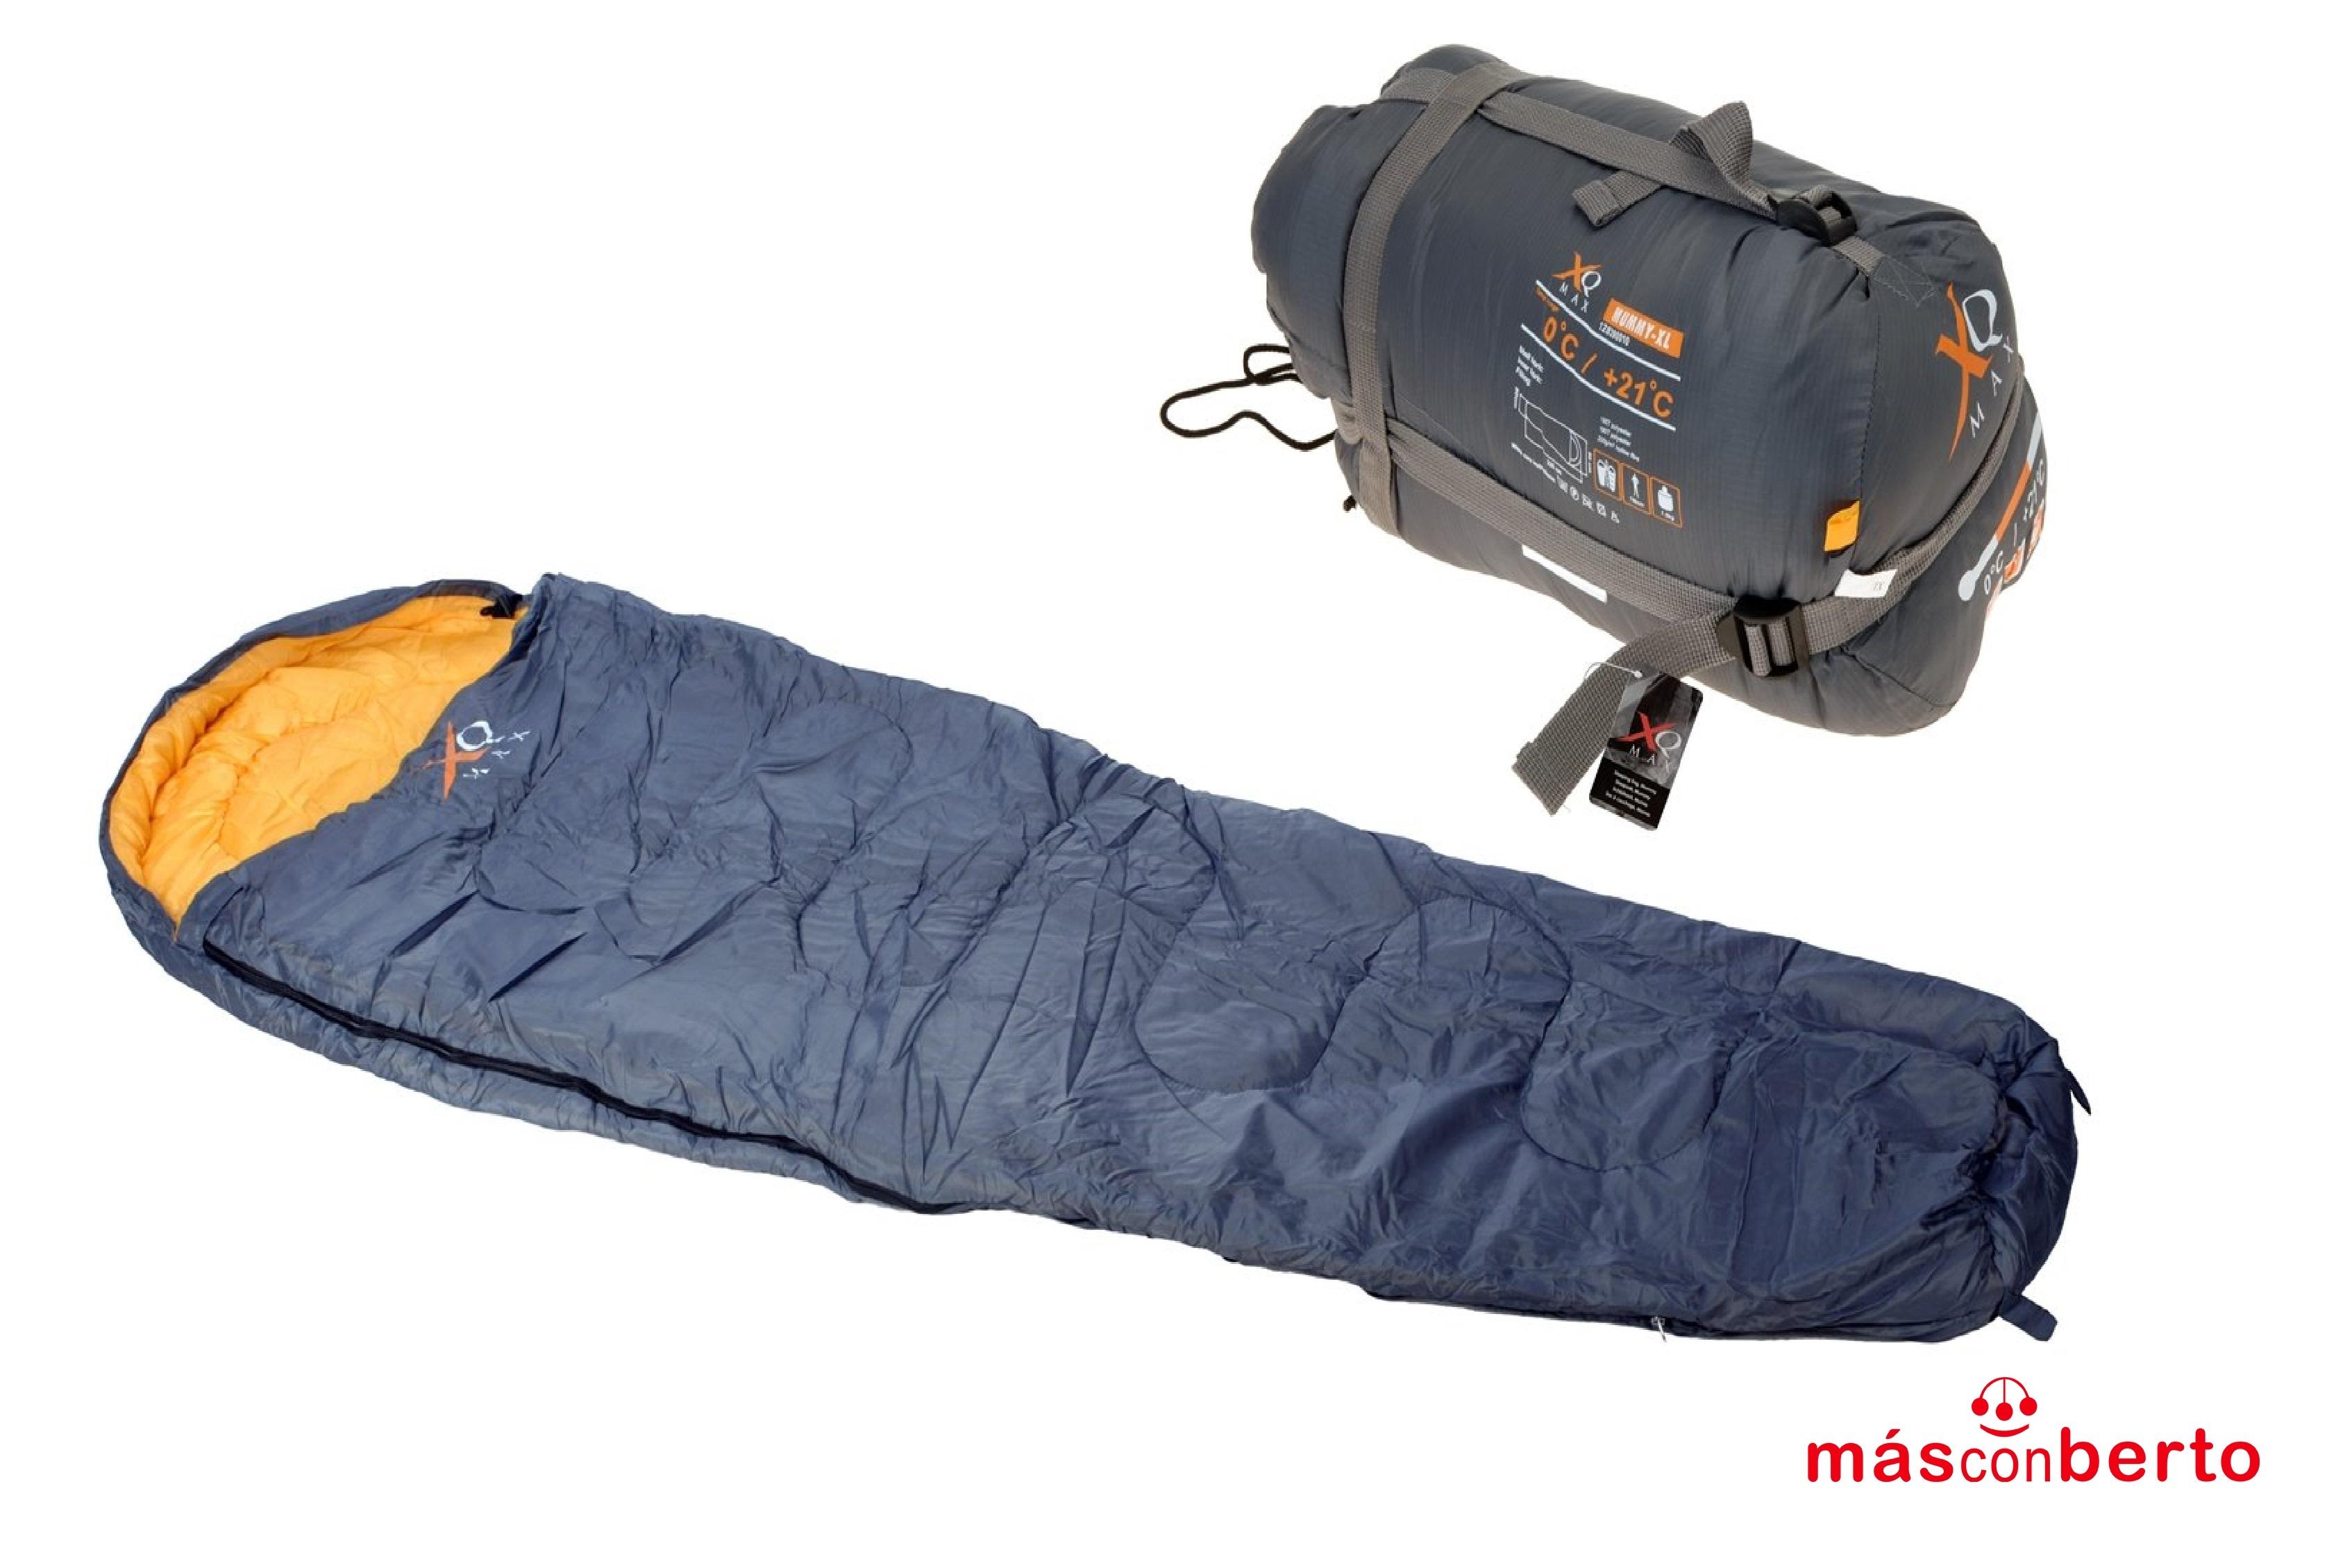 Saco de dormir Mummy-XL XQ Max